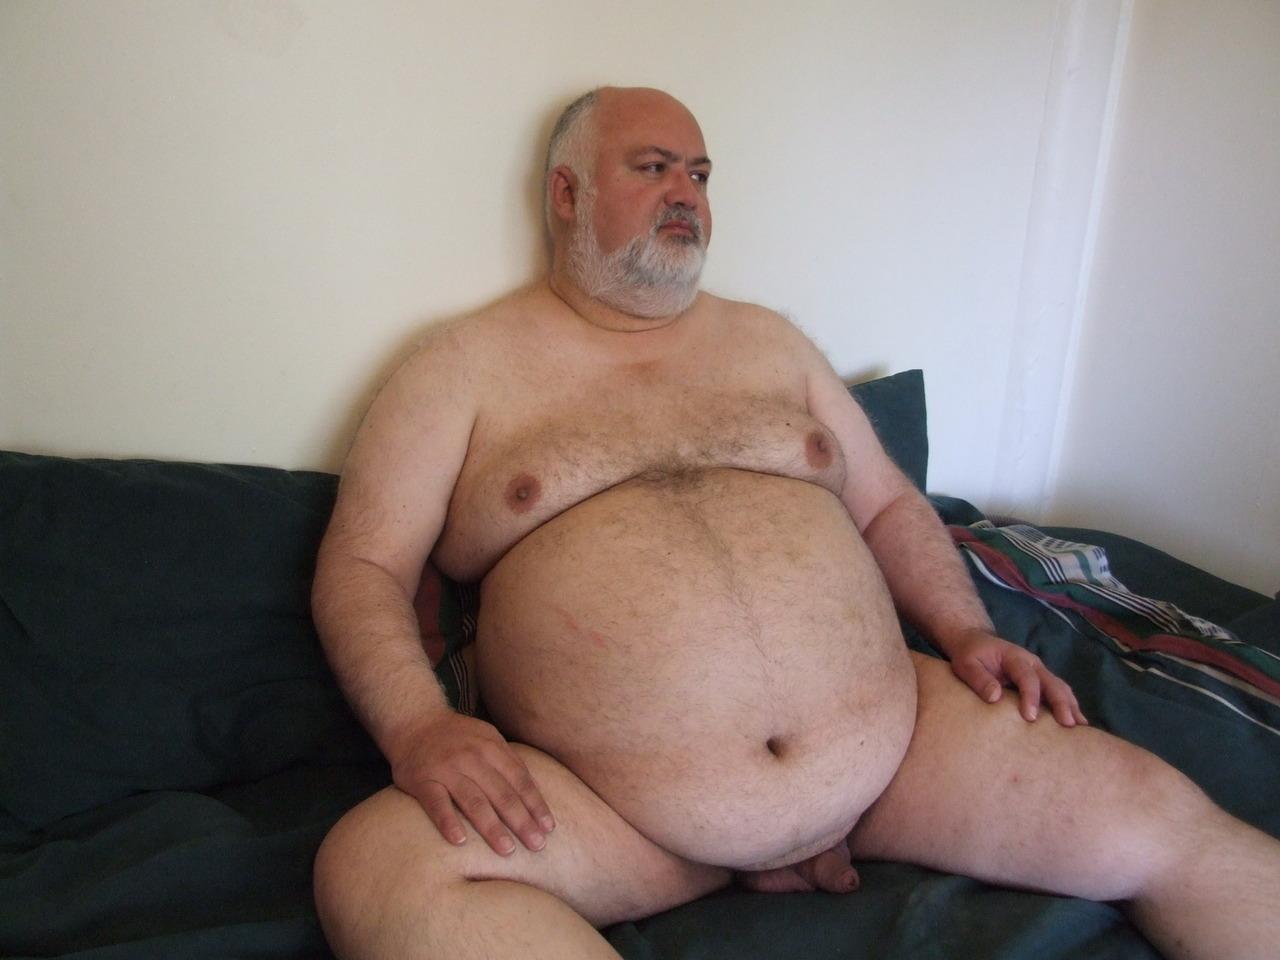 Naked Fat Hairy Man